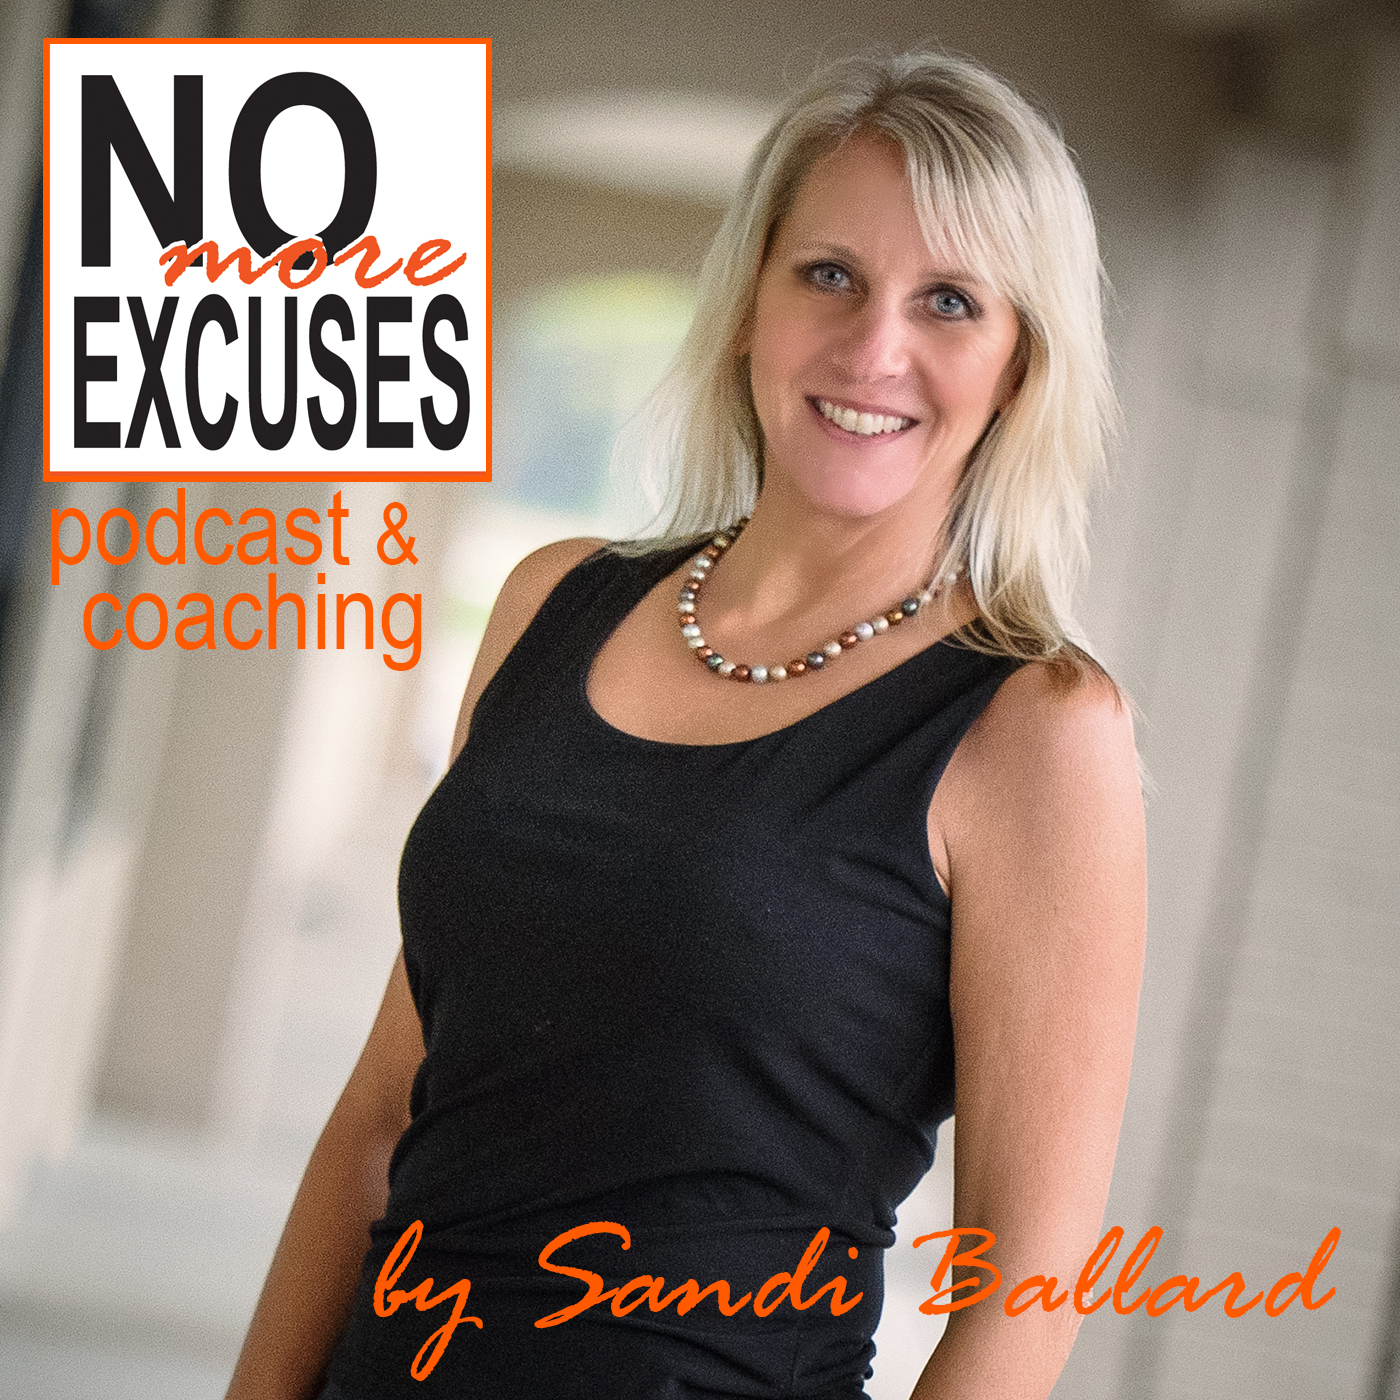 No More Excuses: Monday Motivation podcast show art